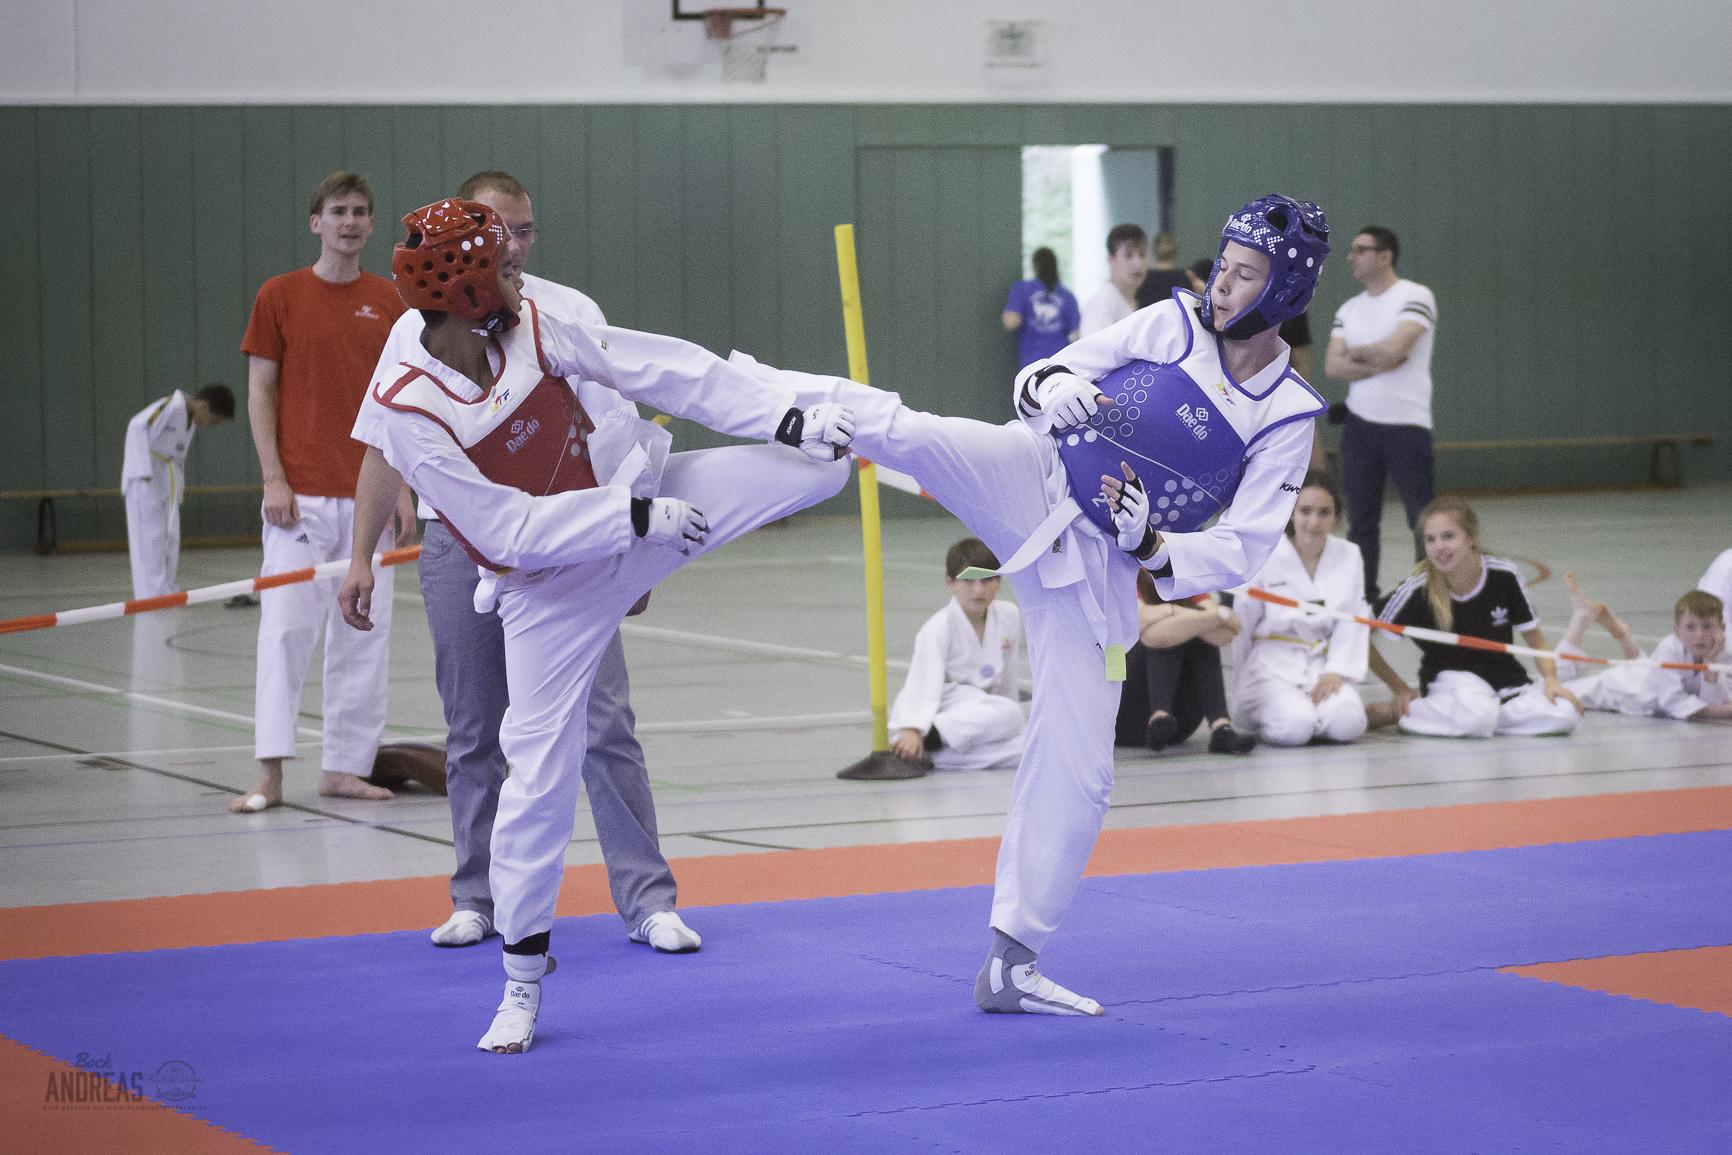 TVBB Masters 2017 – Taekwondo in Potsdam